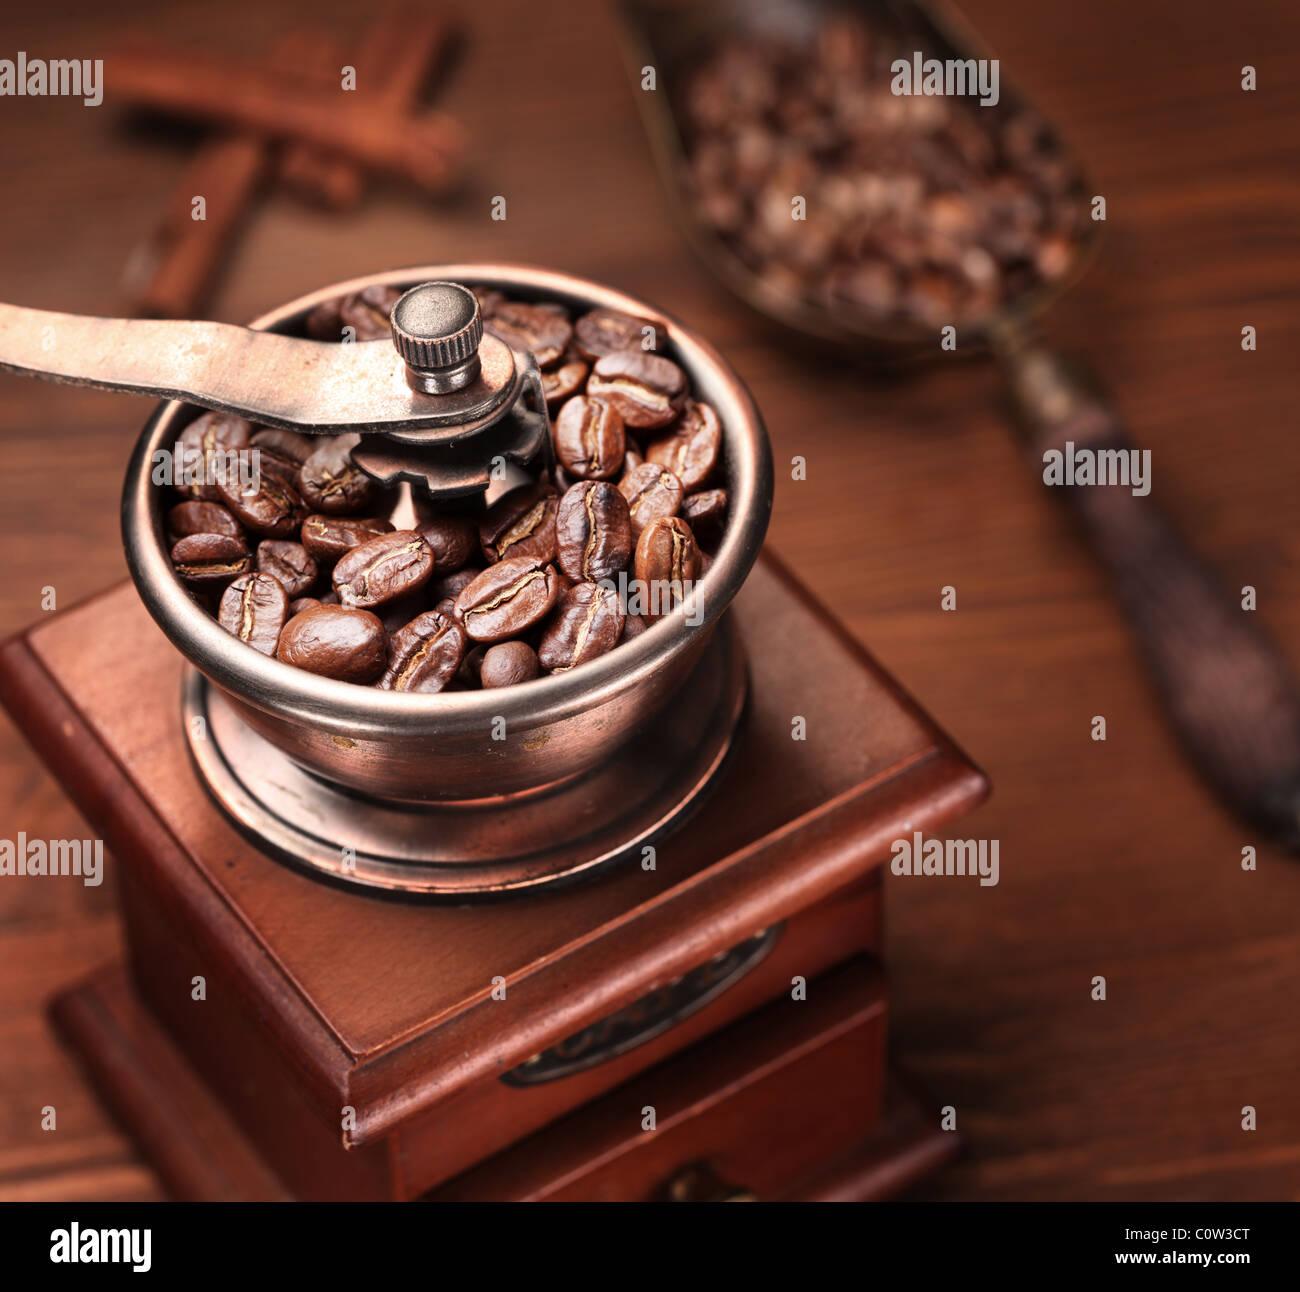 Caffè torrefatto in grani macinati in un macinino da caffè. Immagini Stock